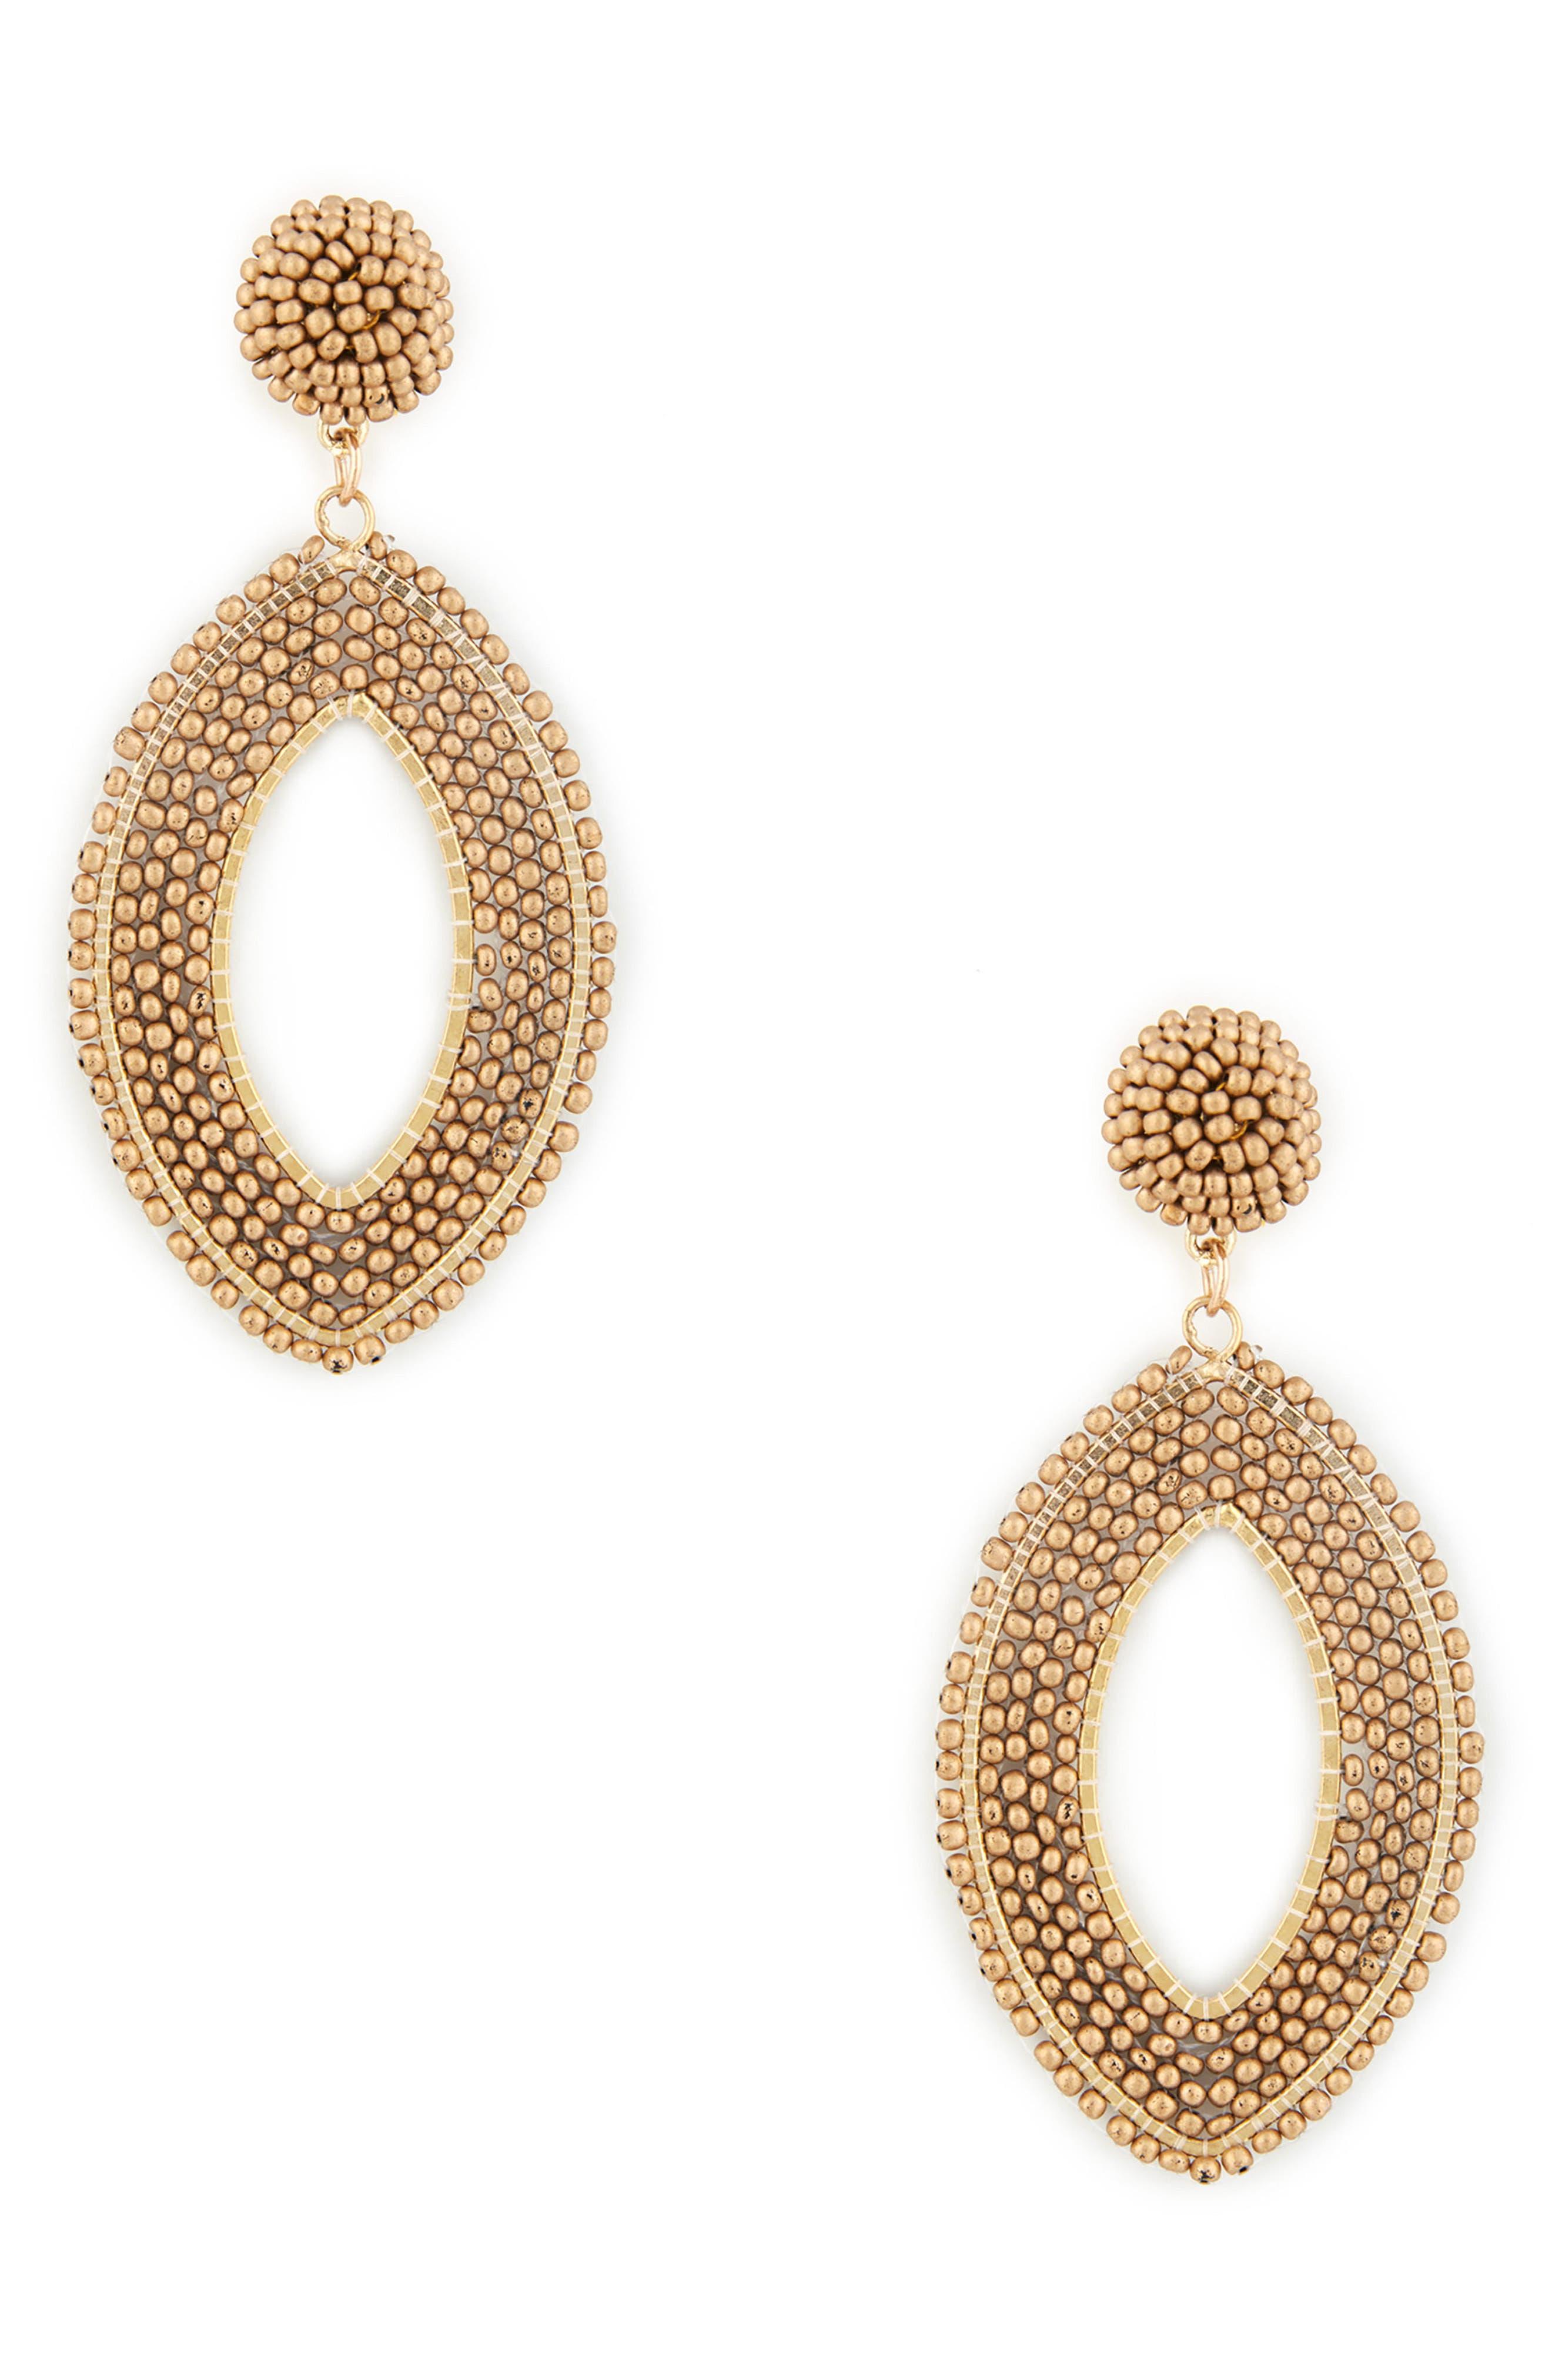 Alternate Image 1 Selected - Sole Society Beaded Tier Drop Earrings